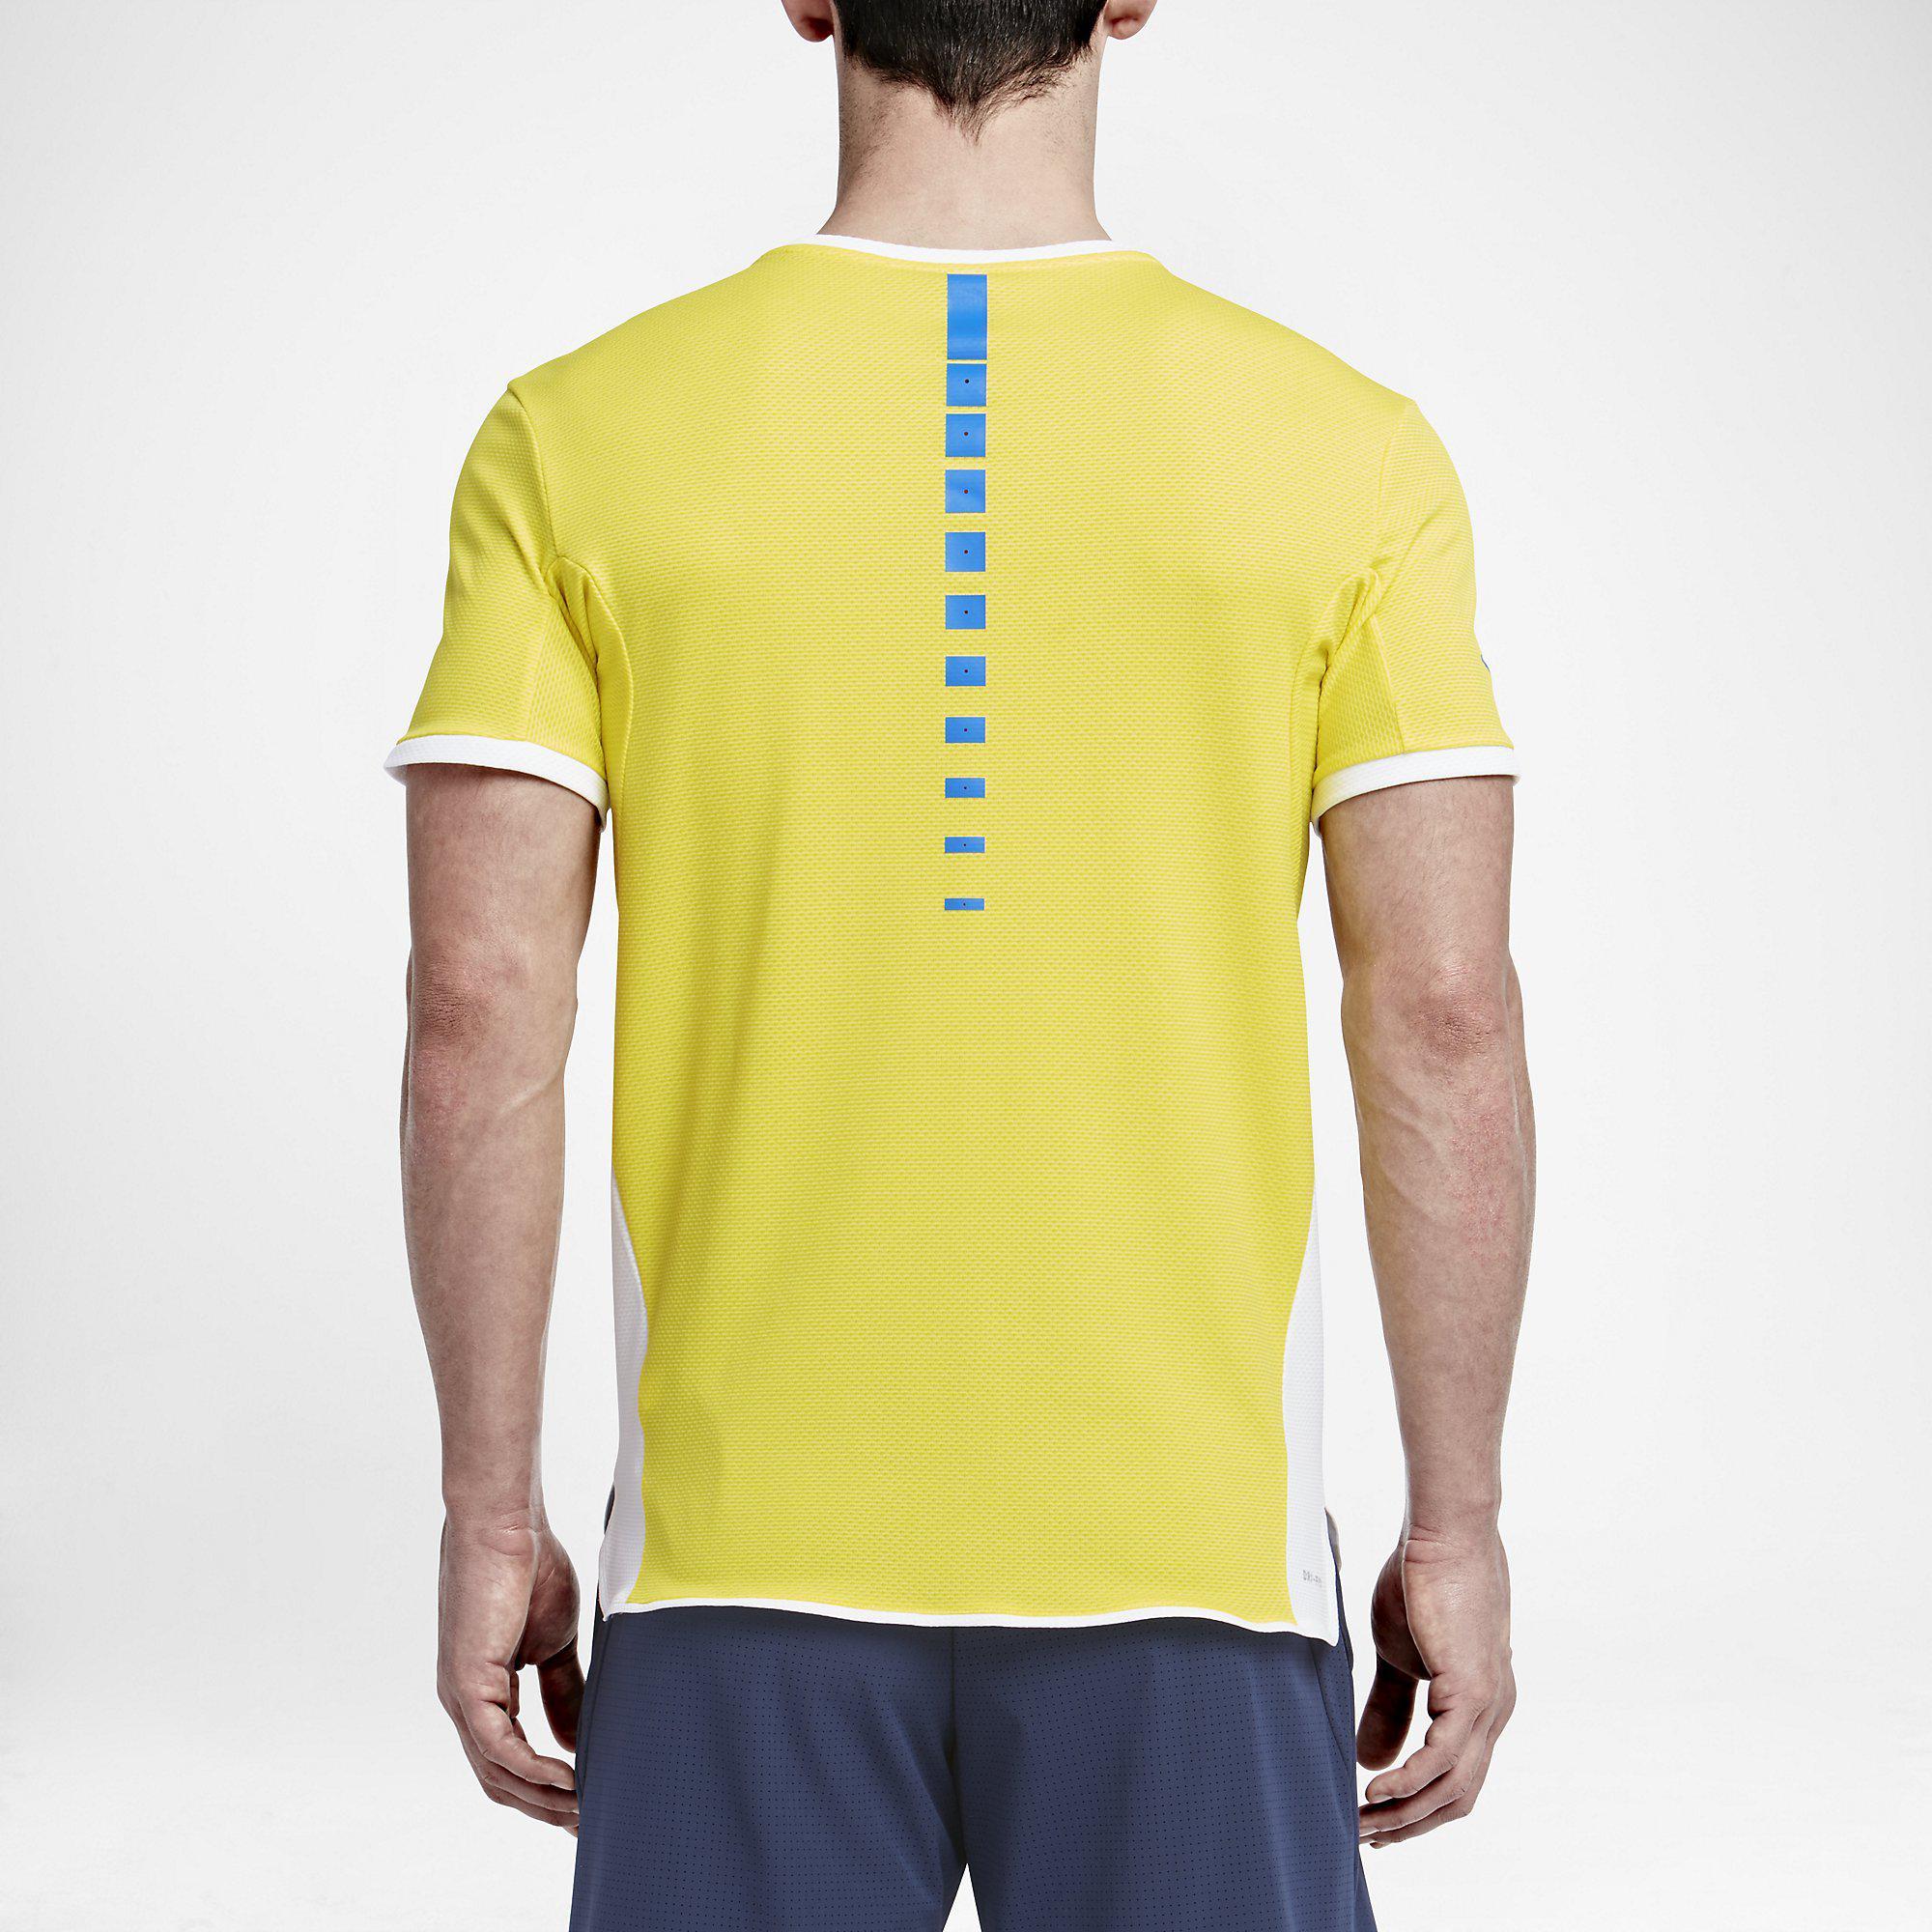 Out Of Stock. Nike Mens Challenger Premier Rafa Crew ...